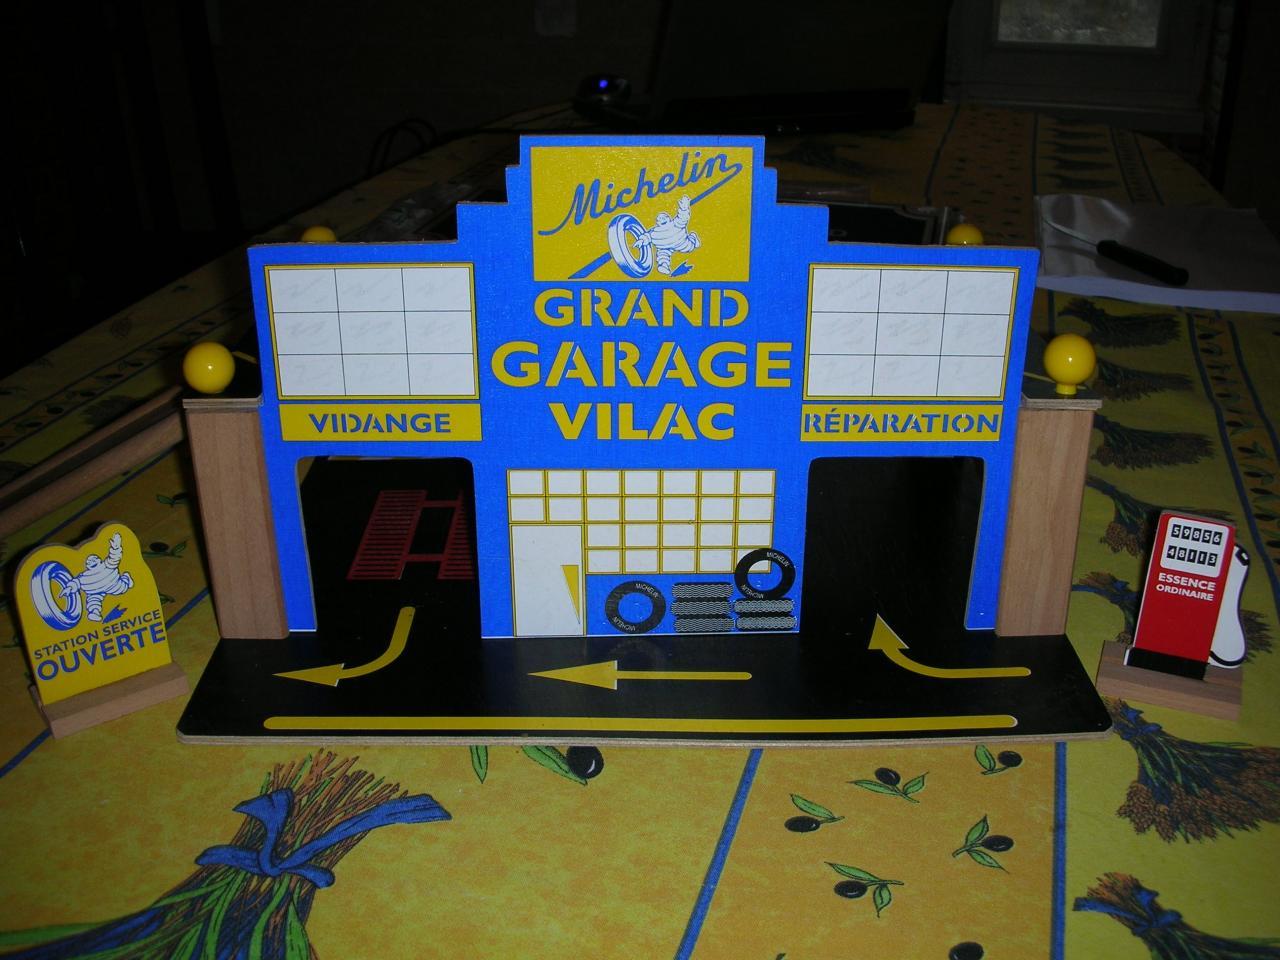 Garage En Bois Vilac : Garage en bois, Vilac